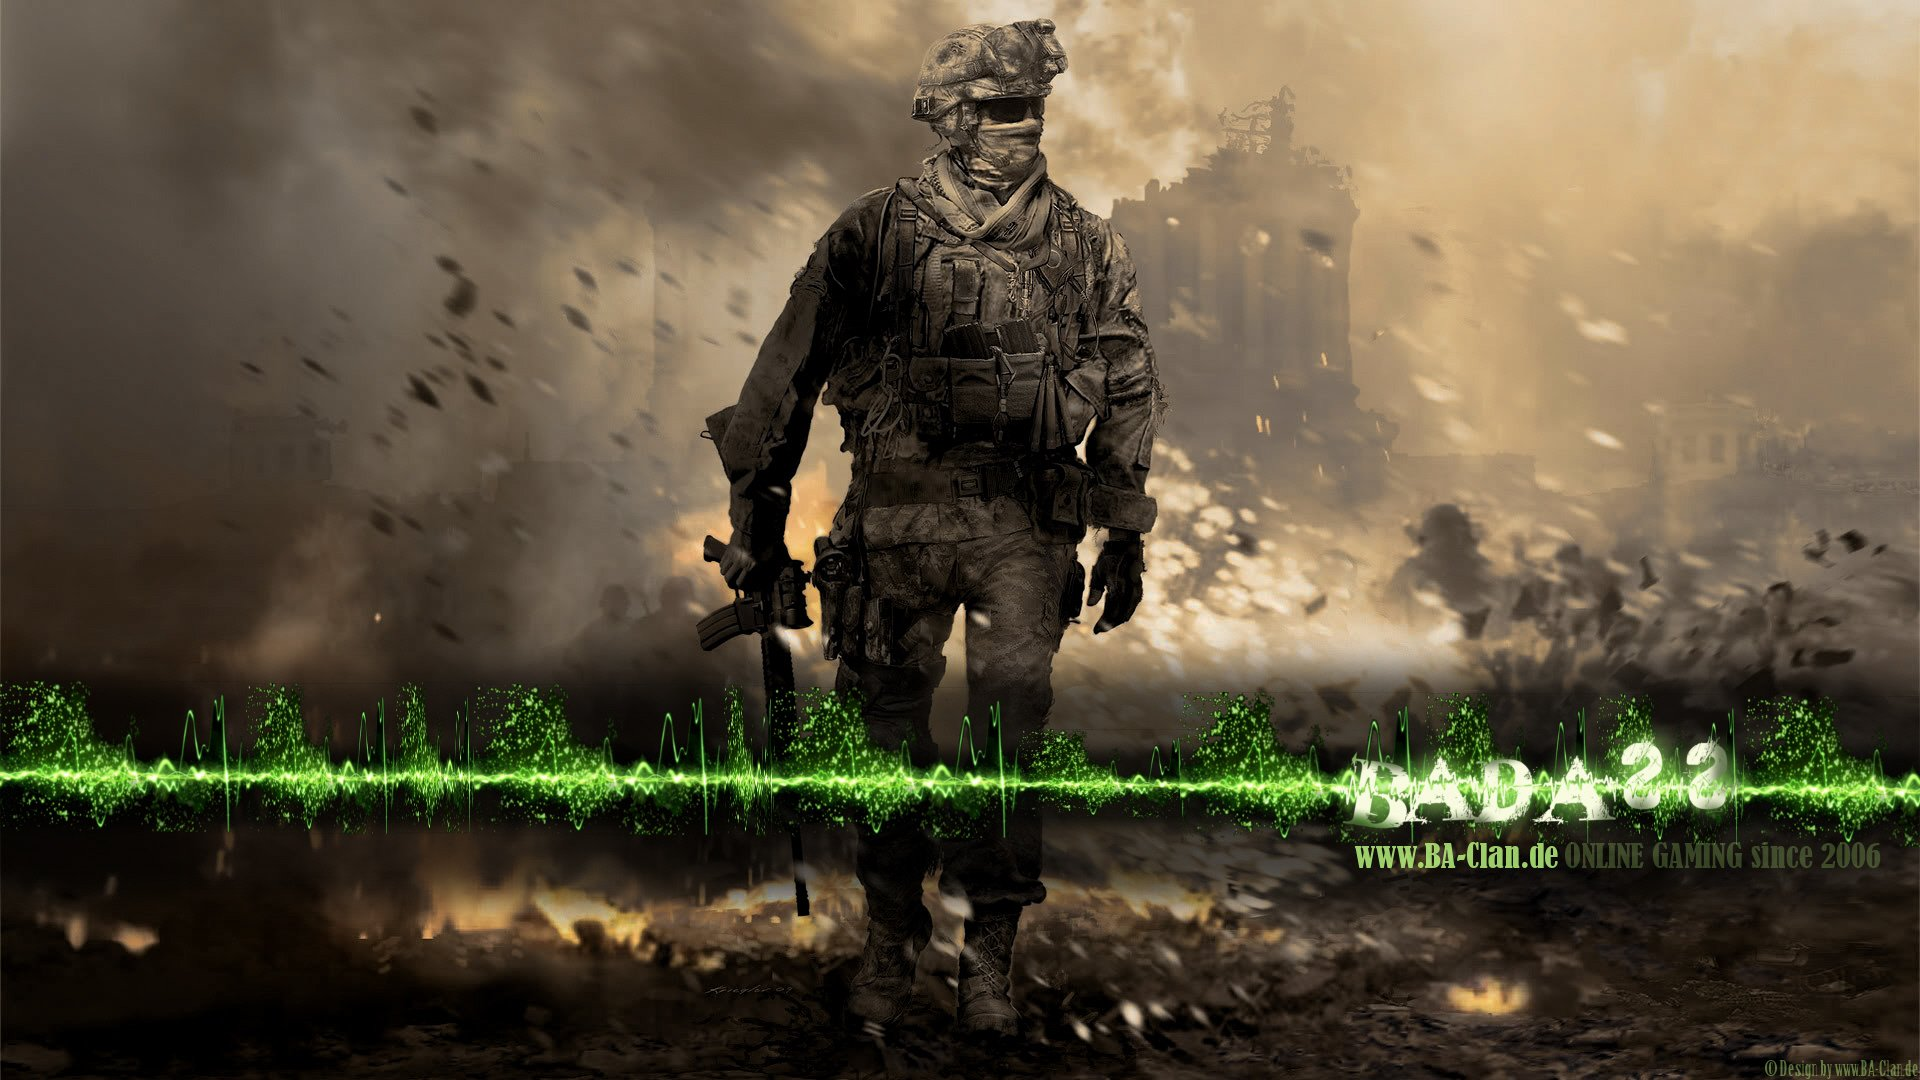 Call of duty modern warfare wallpapers 35 wallpapers - Call of duty warfare wallpaper ...